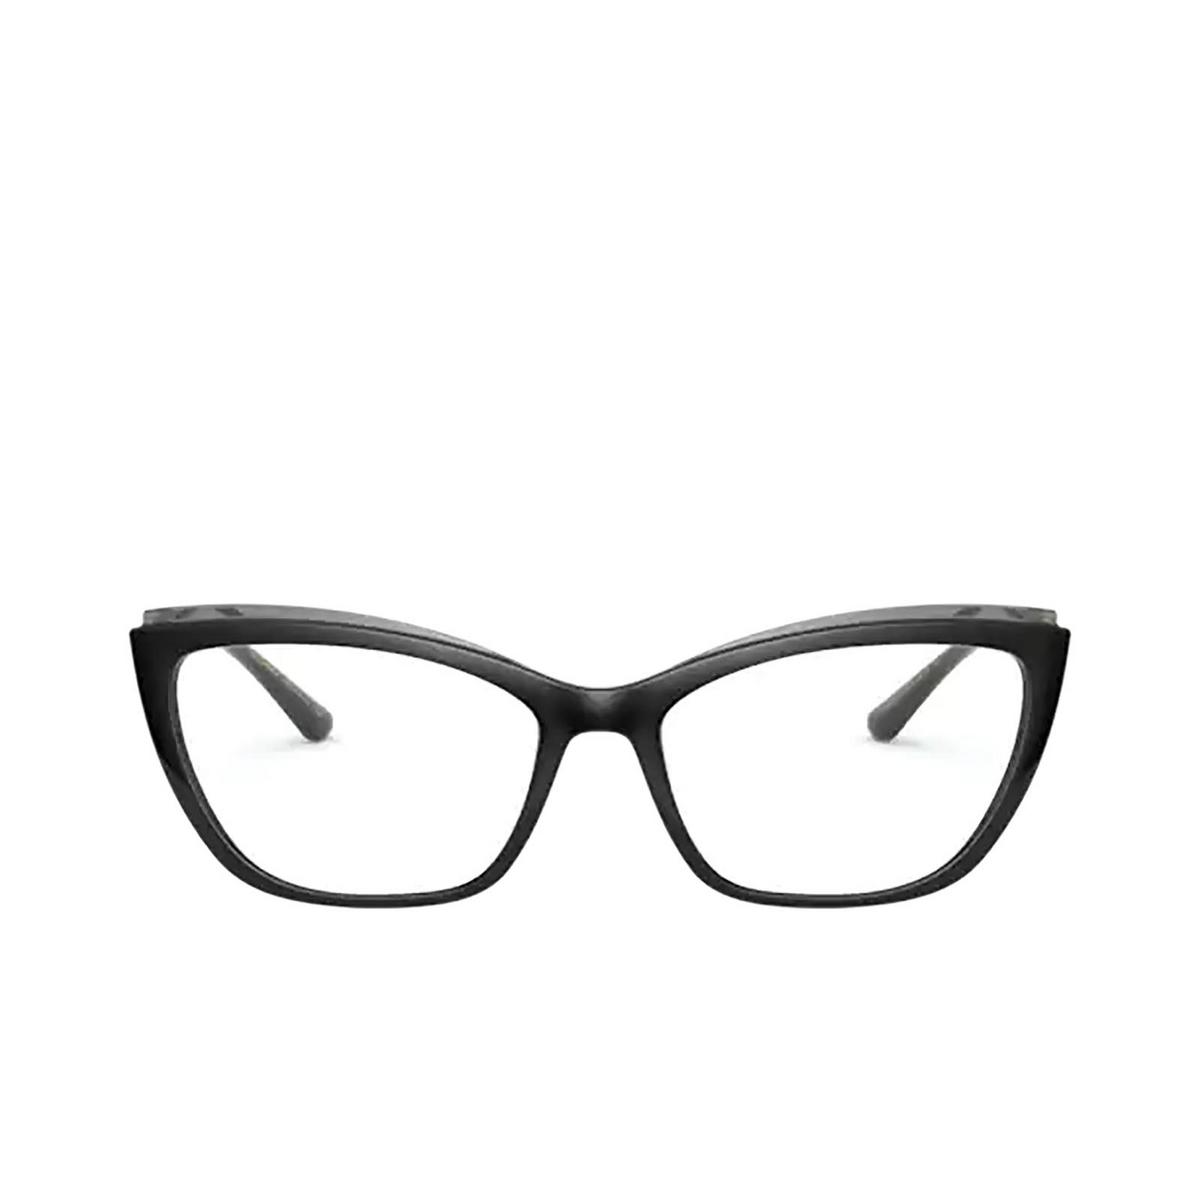 Dolce & Gabbana® Cat-eye Eyeglasses: DG5054 color Black On Transparent Grey 3246 - front view.